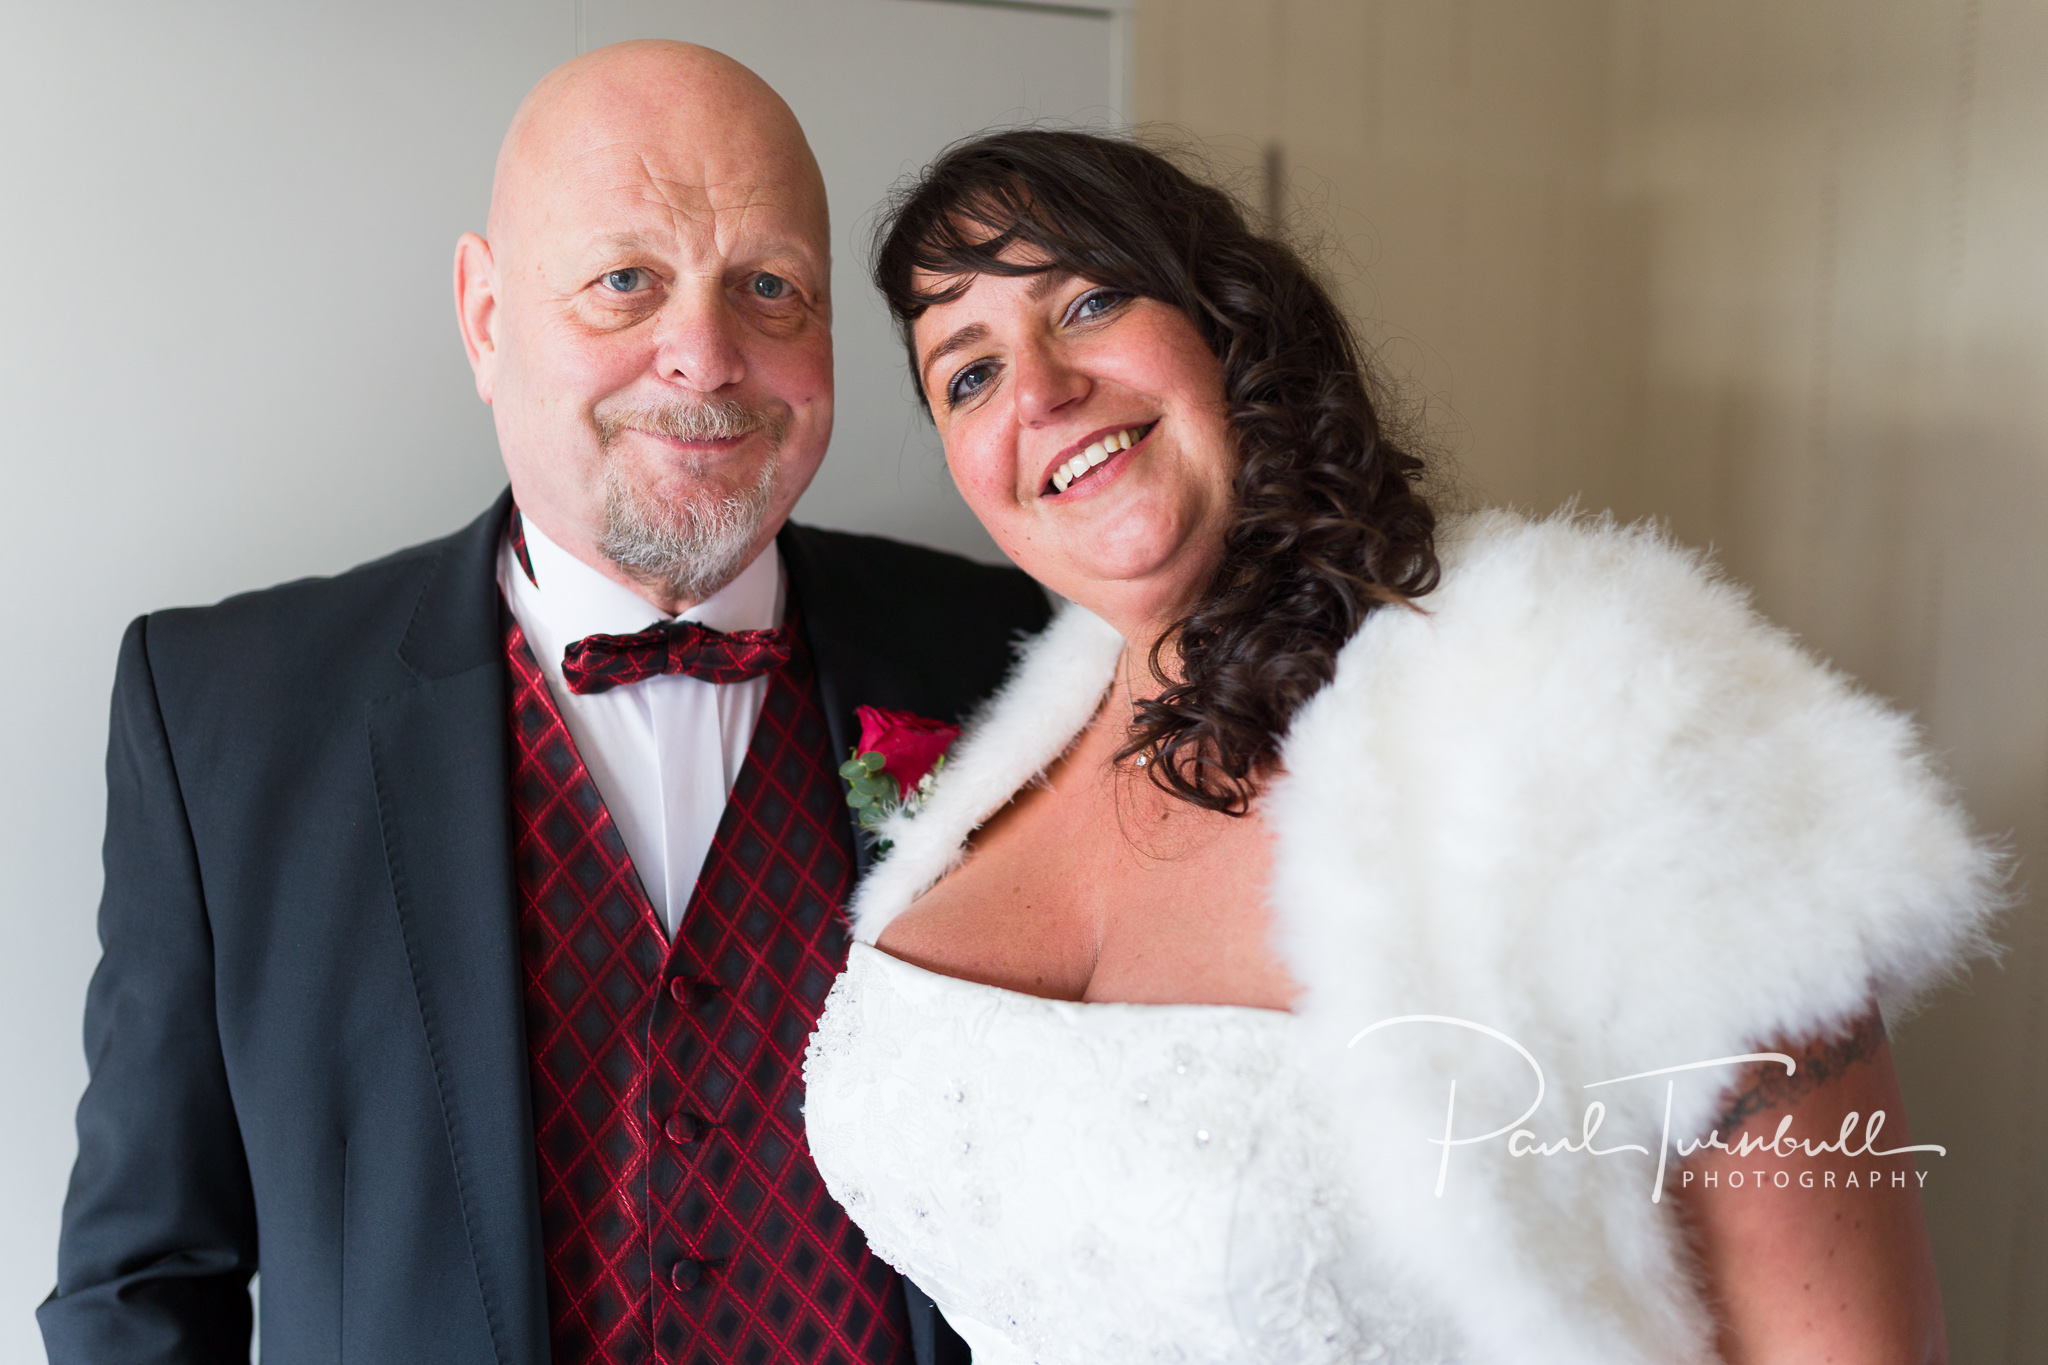 wedding-photographer-leeds-town-hall-005.jpg